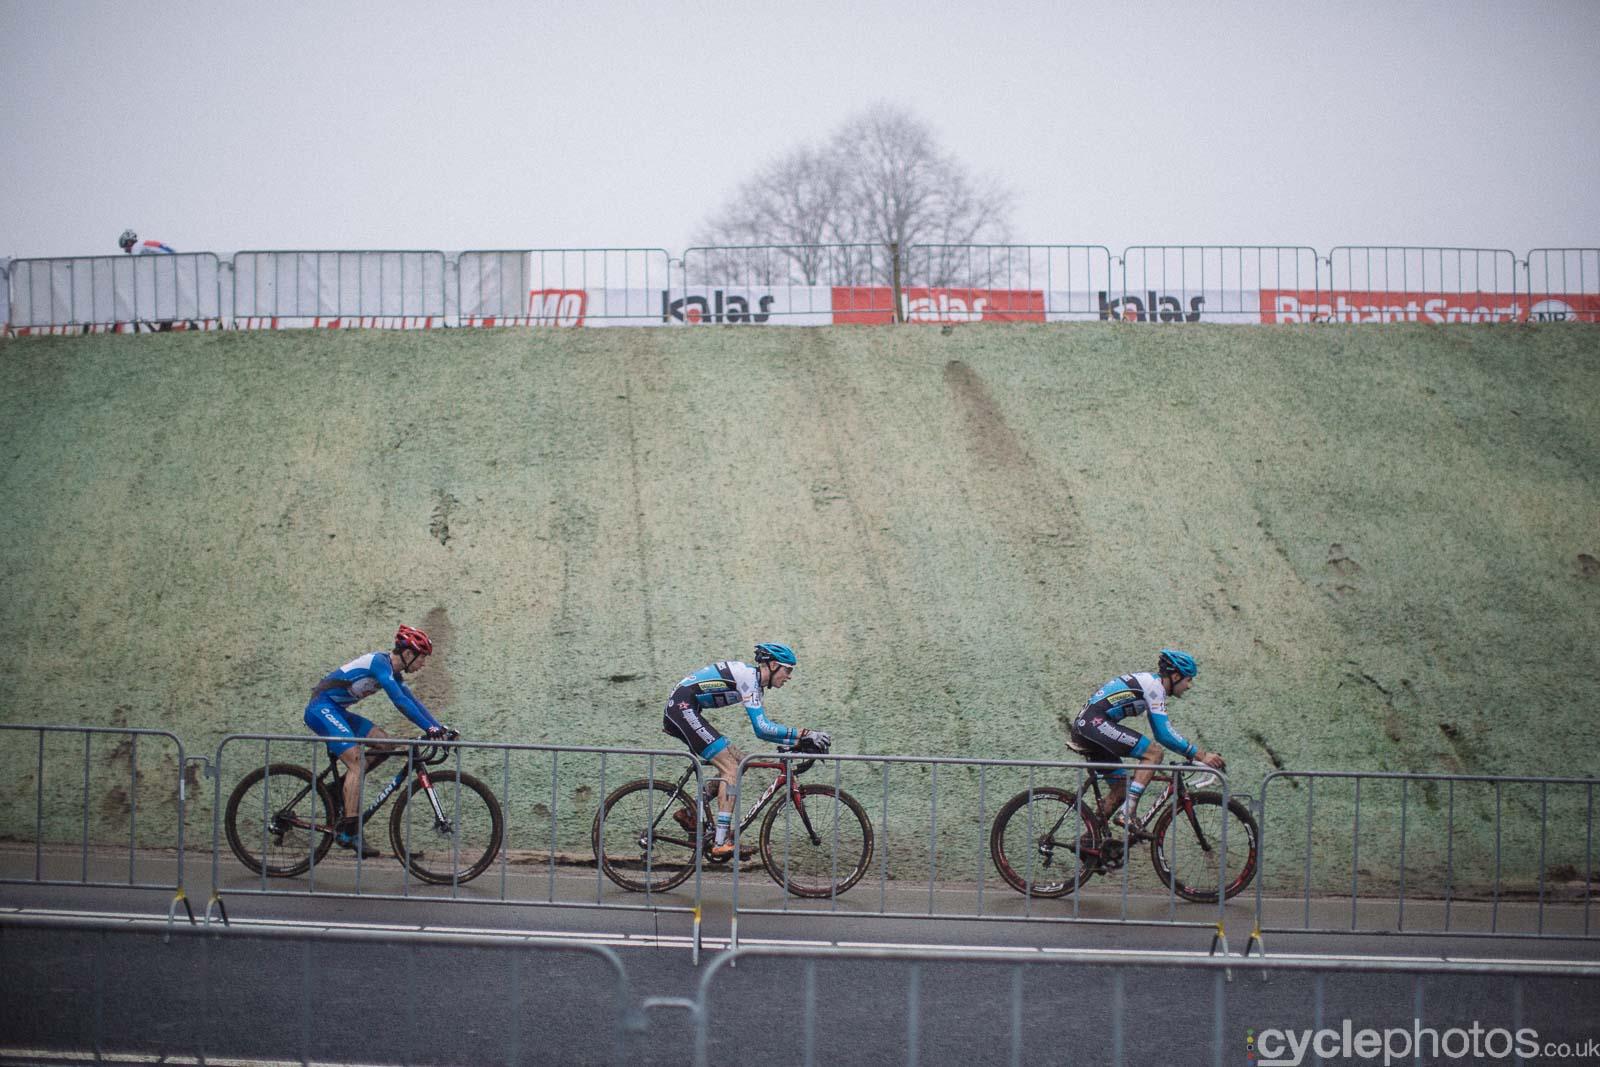 2016-cyclephotos-cyclocross-hoogerheide-152535-lars-michael-gianni